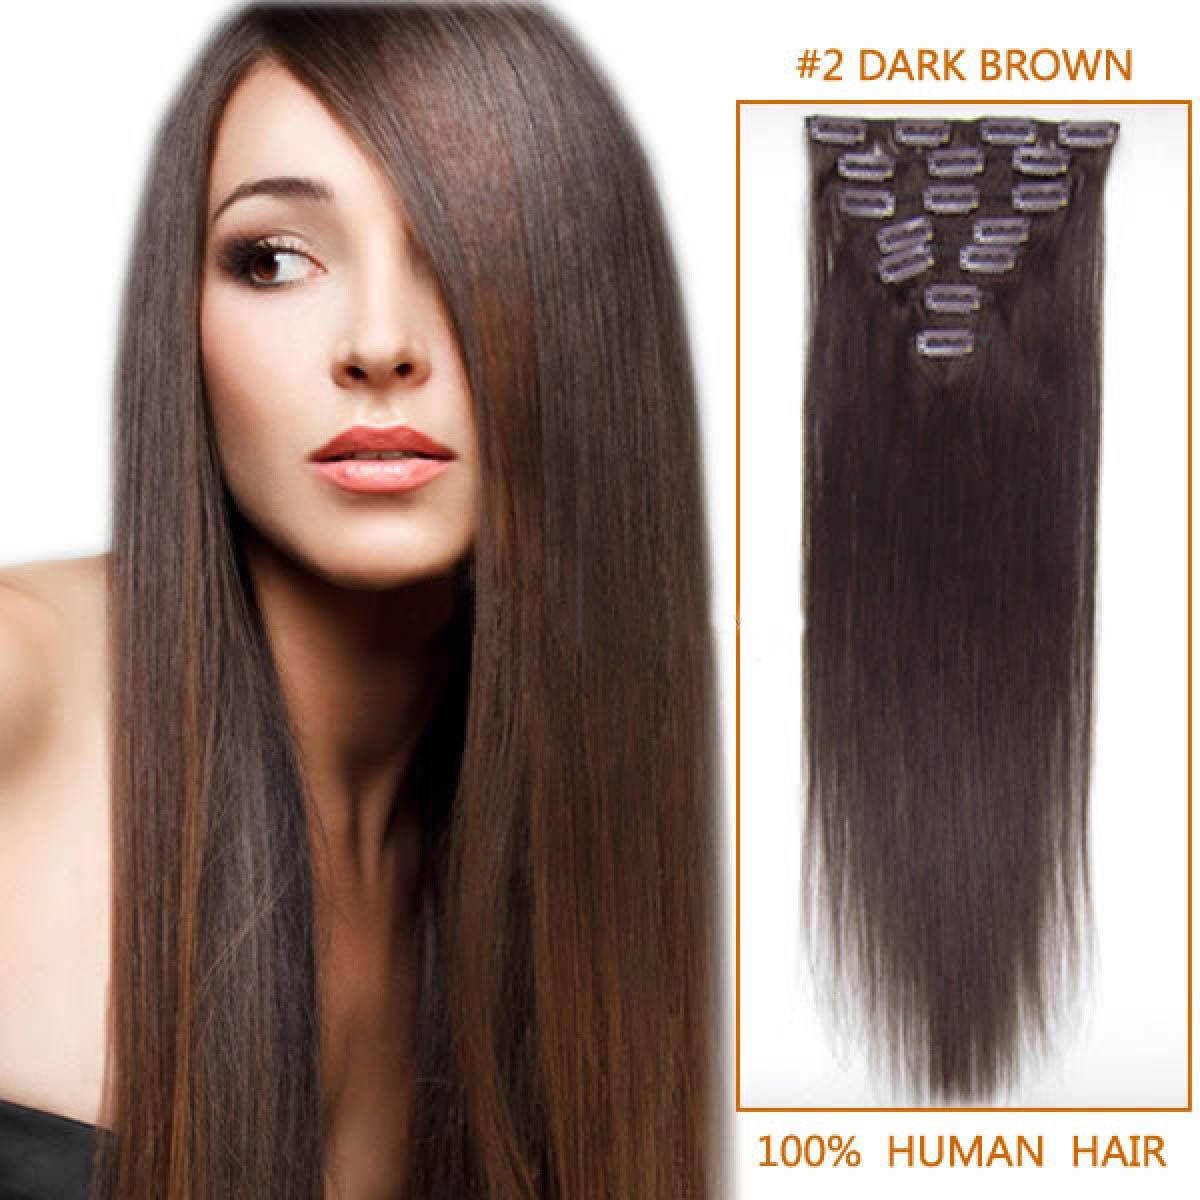 22 Inch 2 Dark Brown Clip In Human Hair Extensions 11pcs